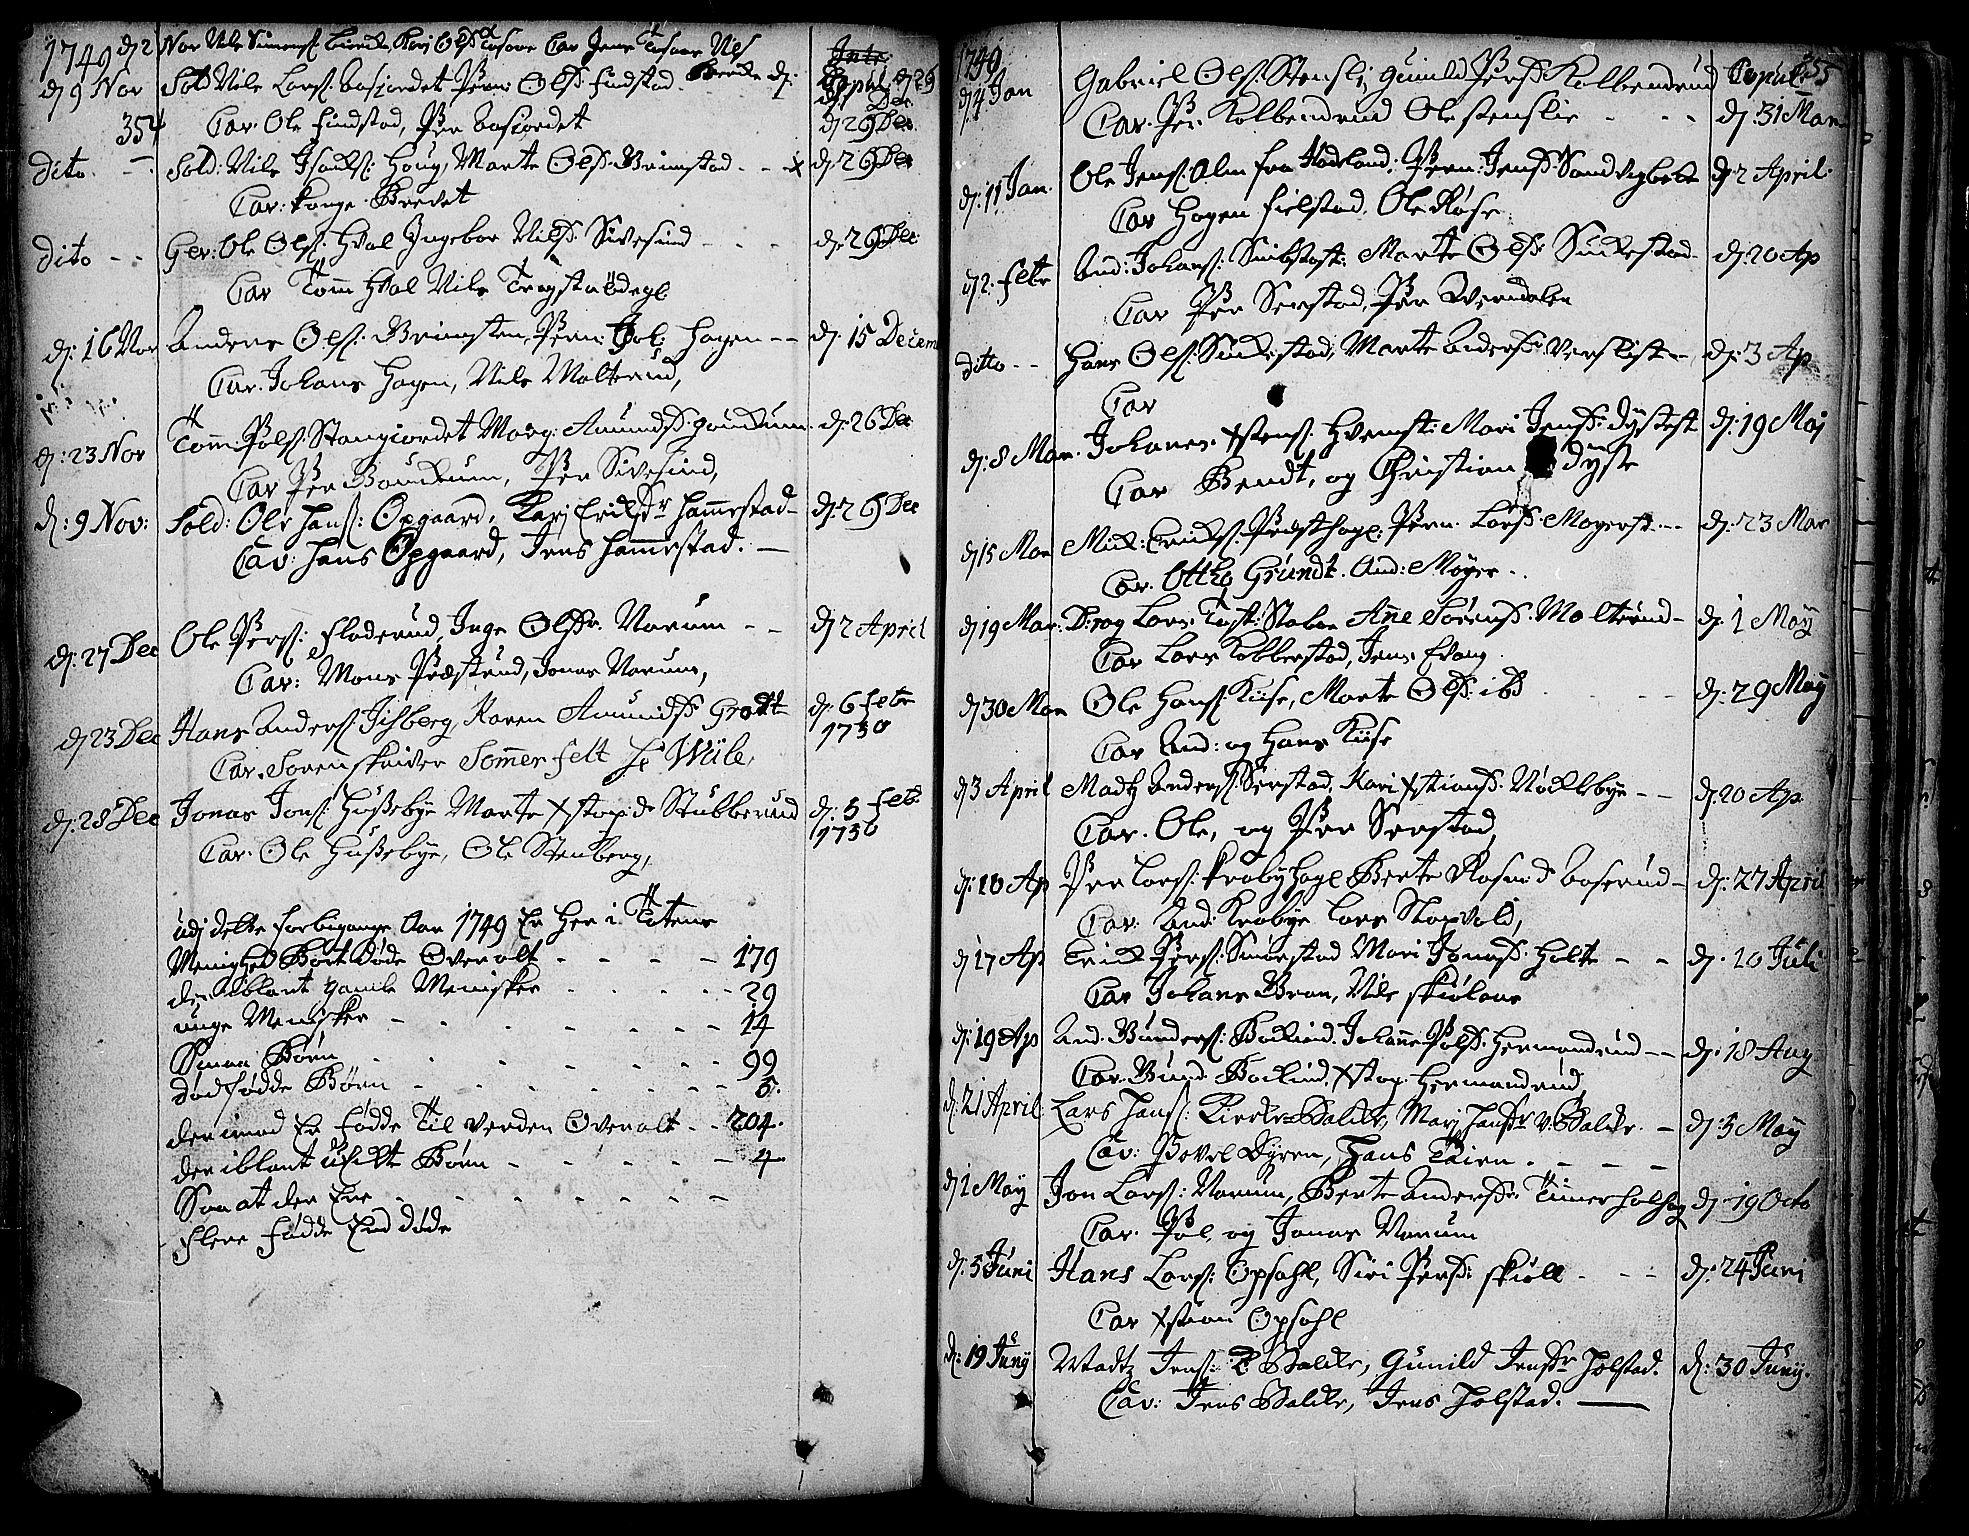 SAH, Toten prestekontor, Ministerialbok nr. 3, 1734-1751, s. 354-355